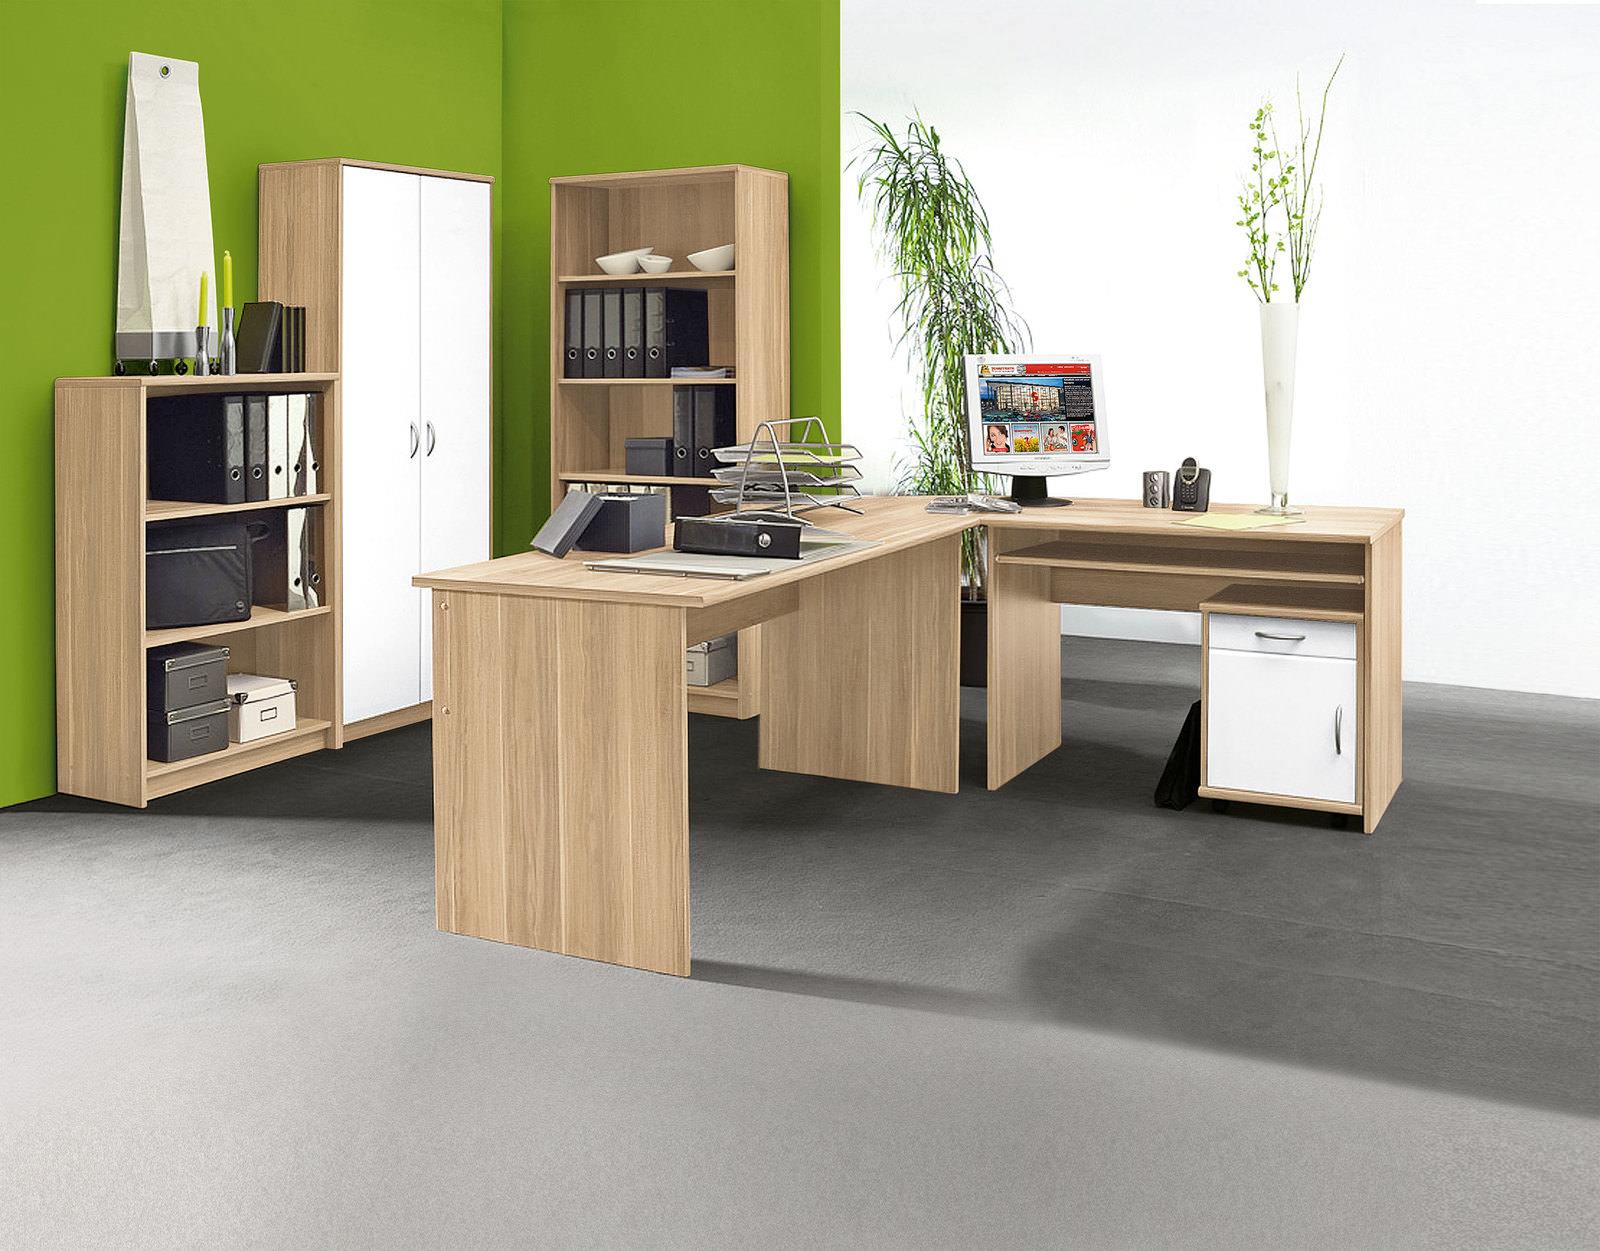 Küchen Smidt Langenfeld | Kchenkauf Trendy Gallery Of Hover To Zoom ...